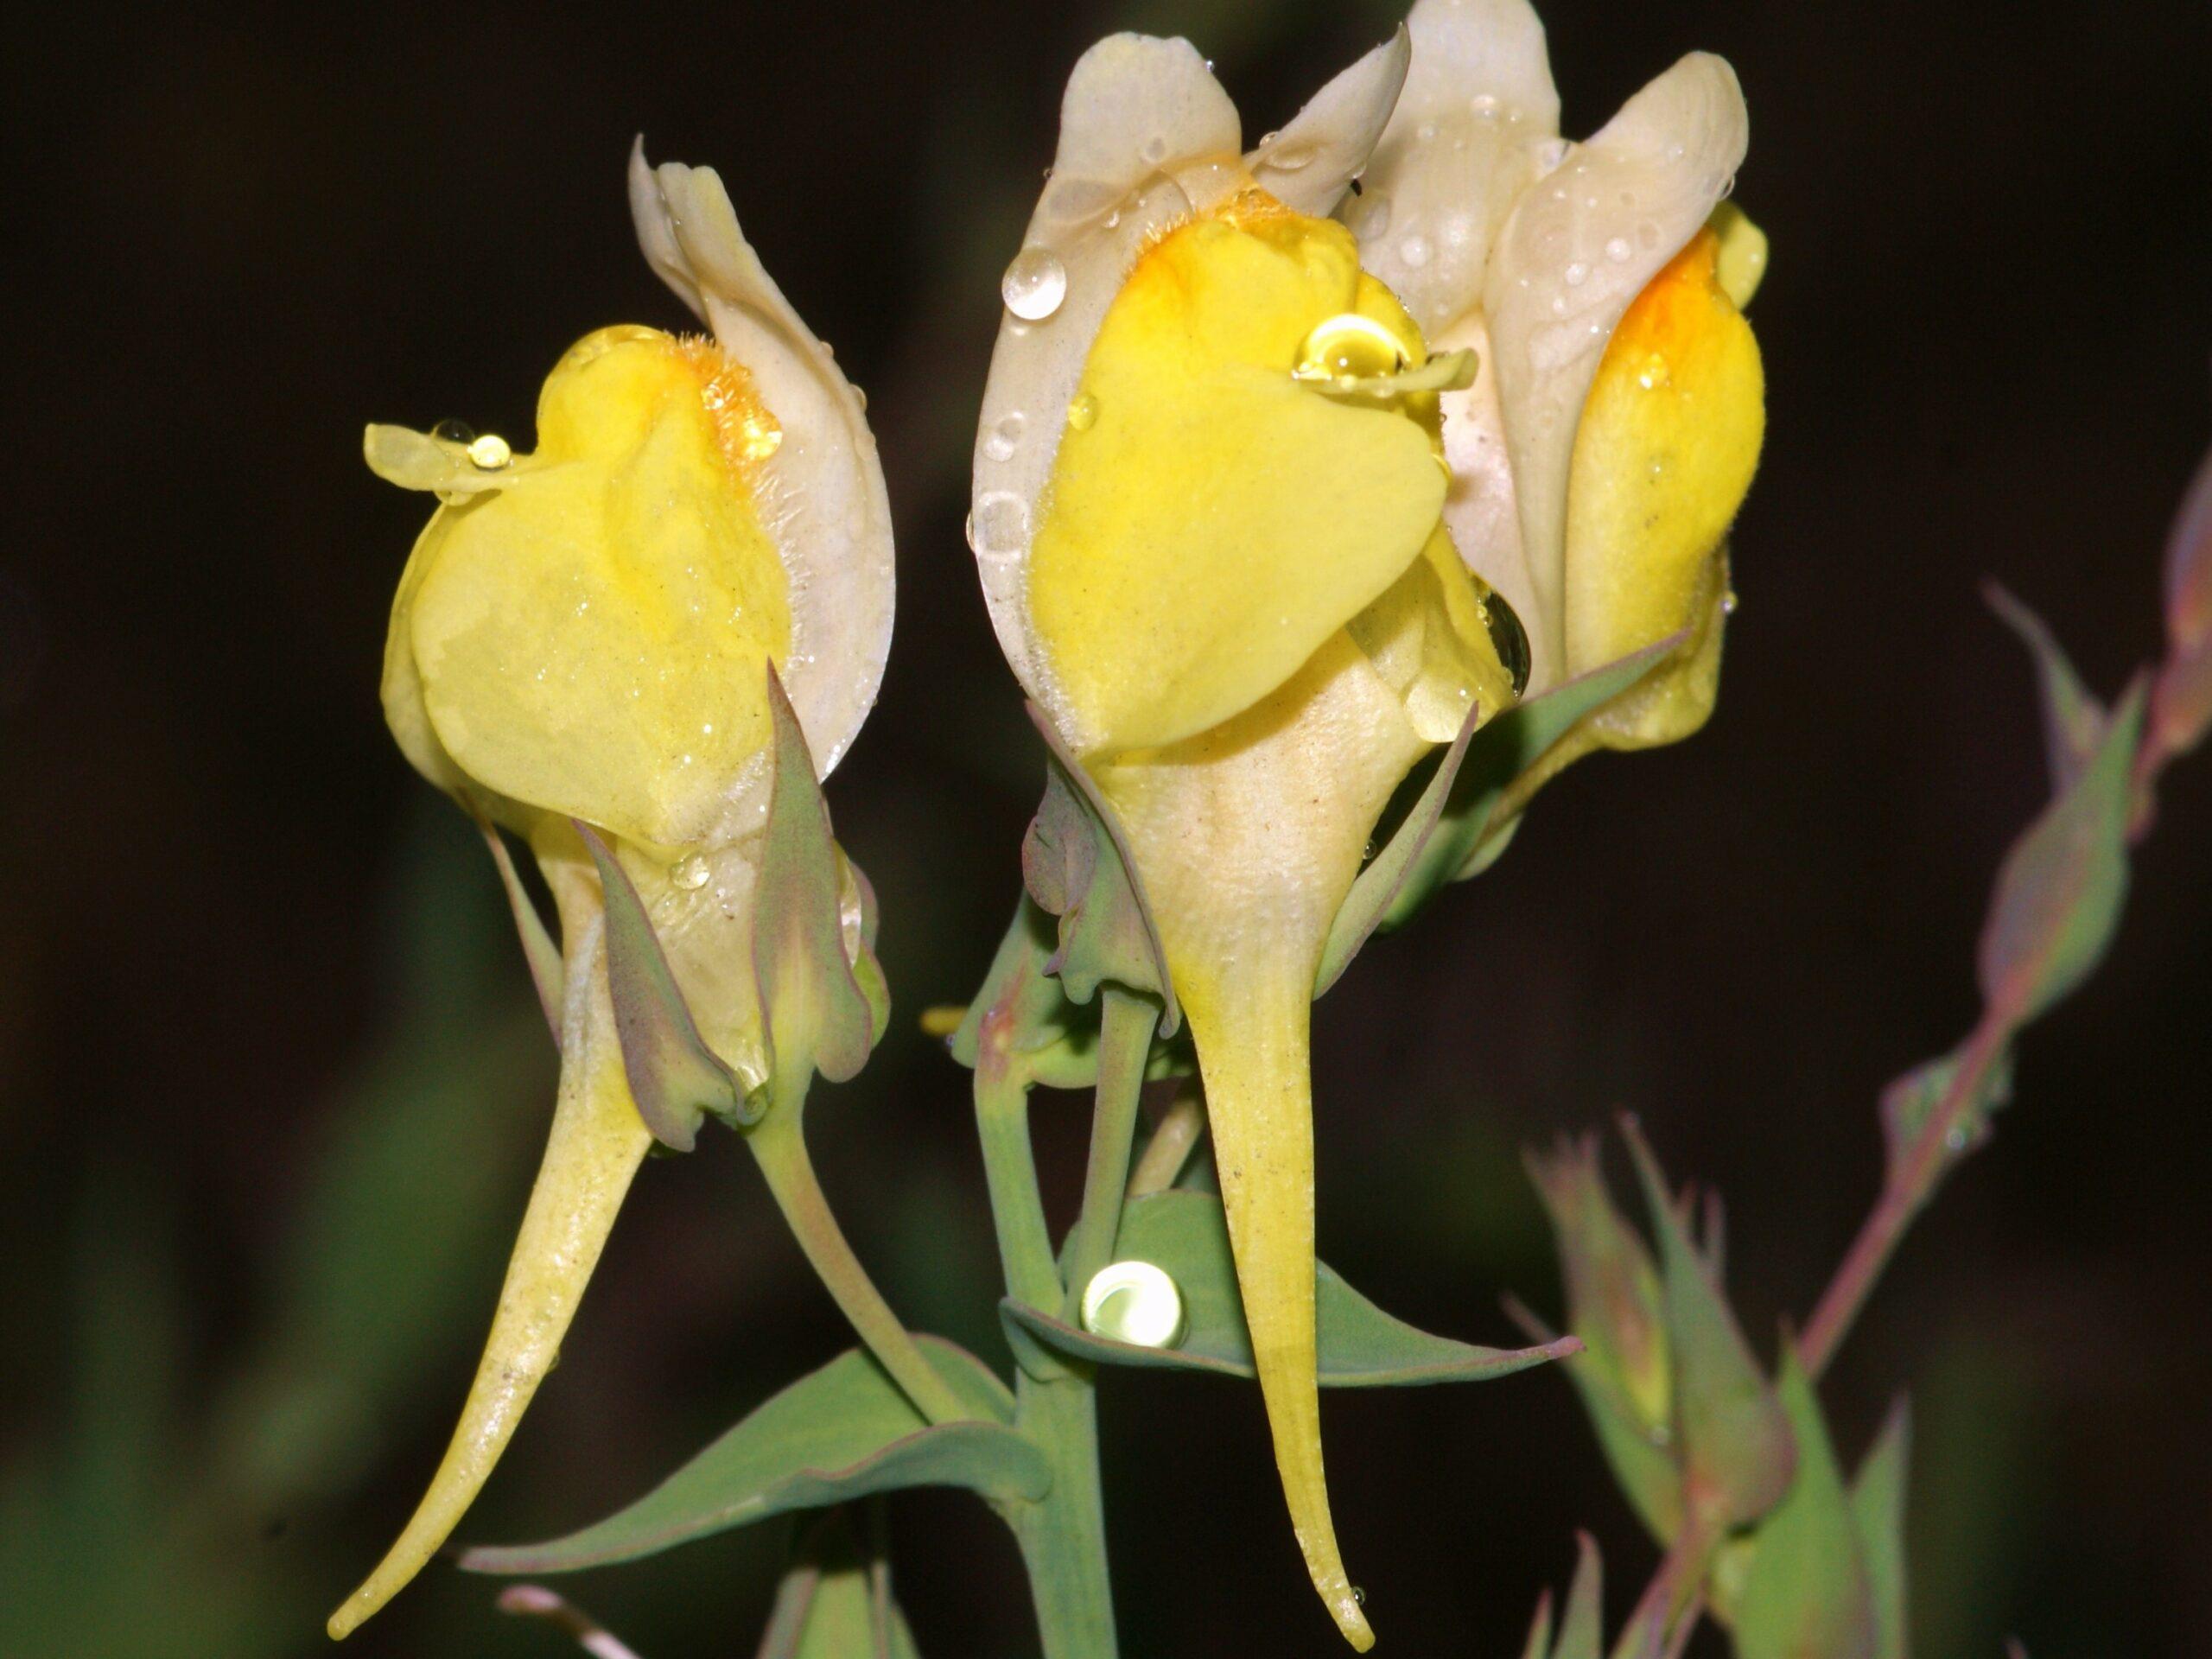 Linaria dalmatica_dalmatian toadflax_flowers_Bob Case_cropped